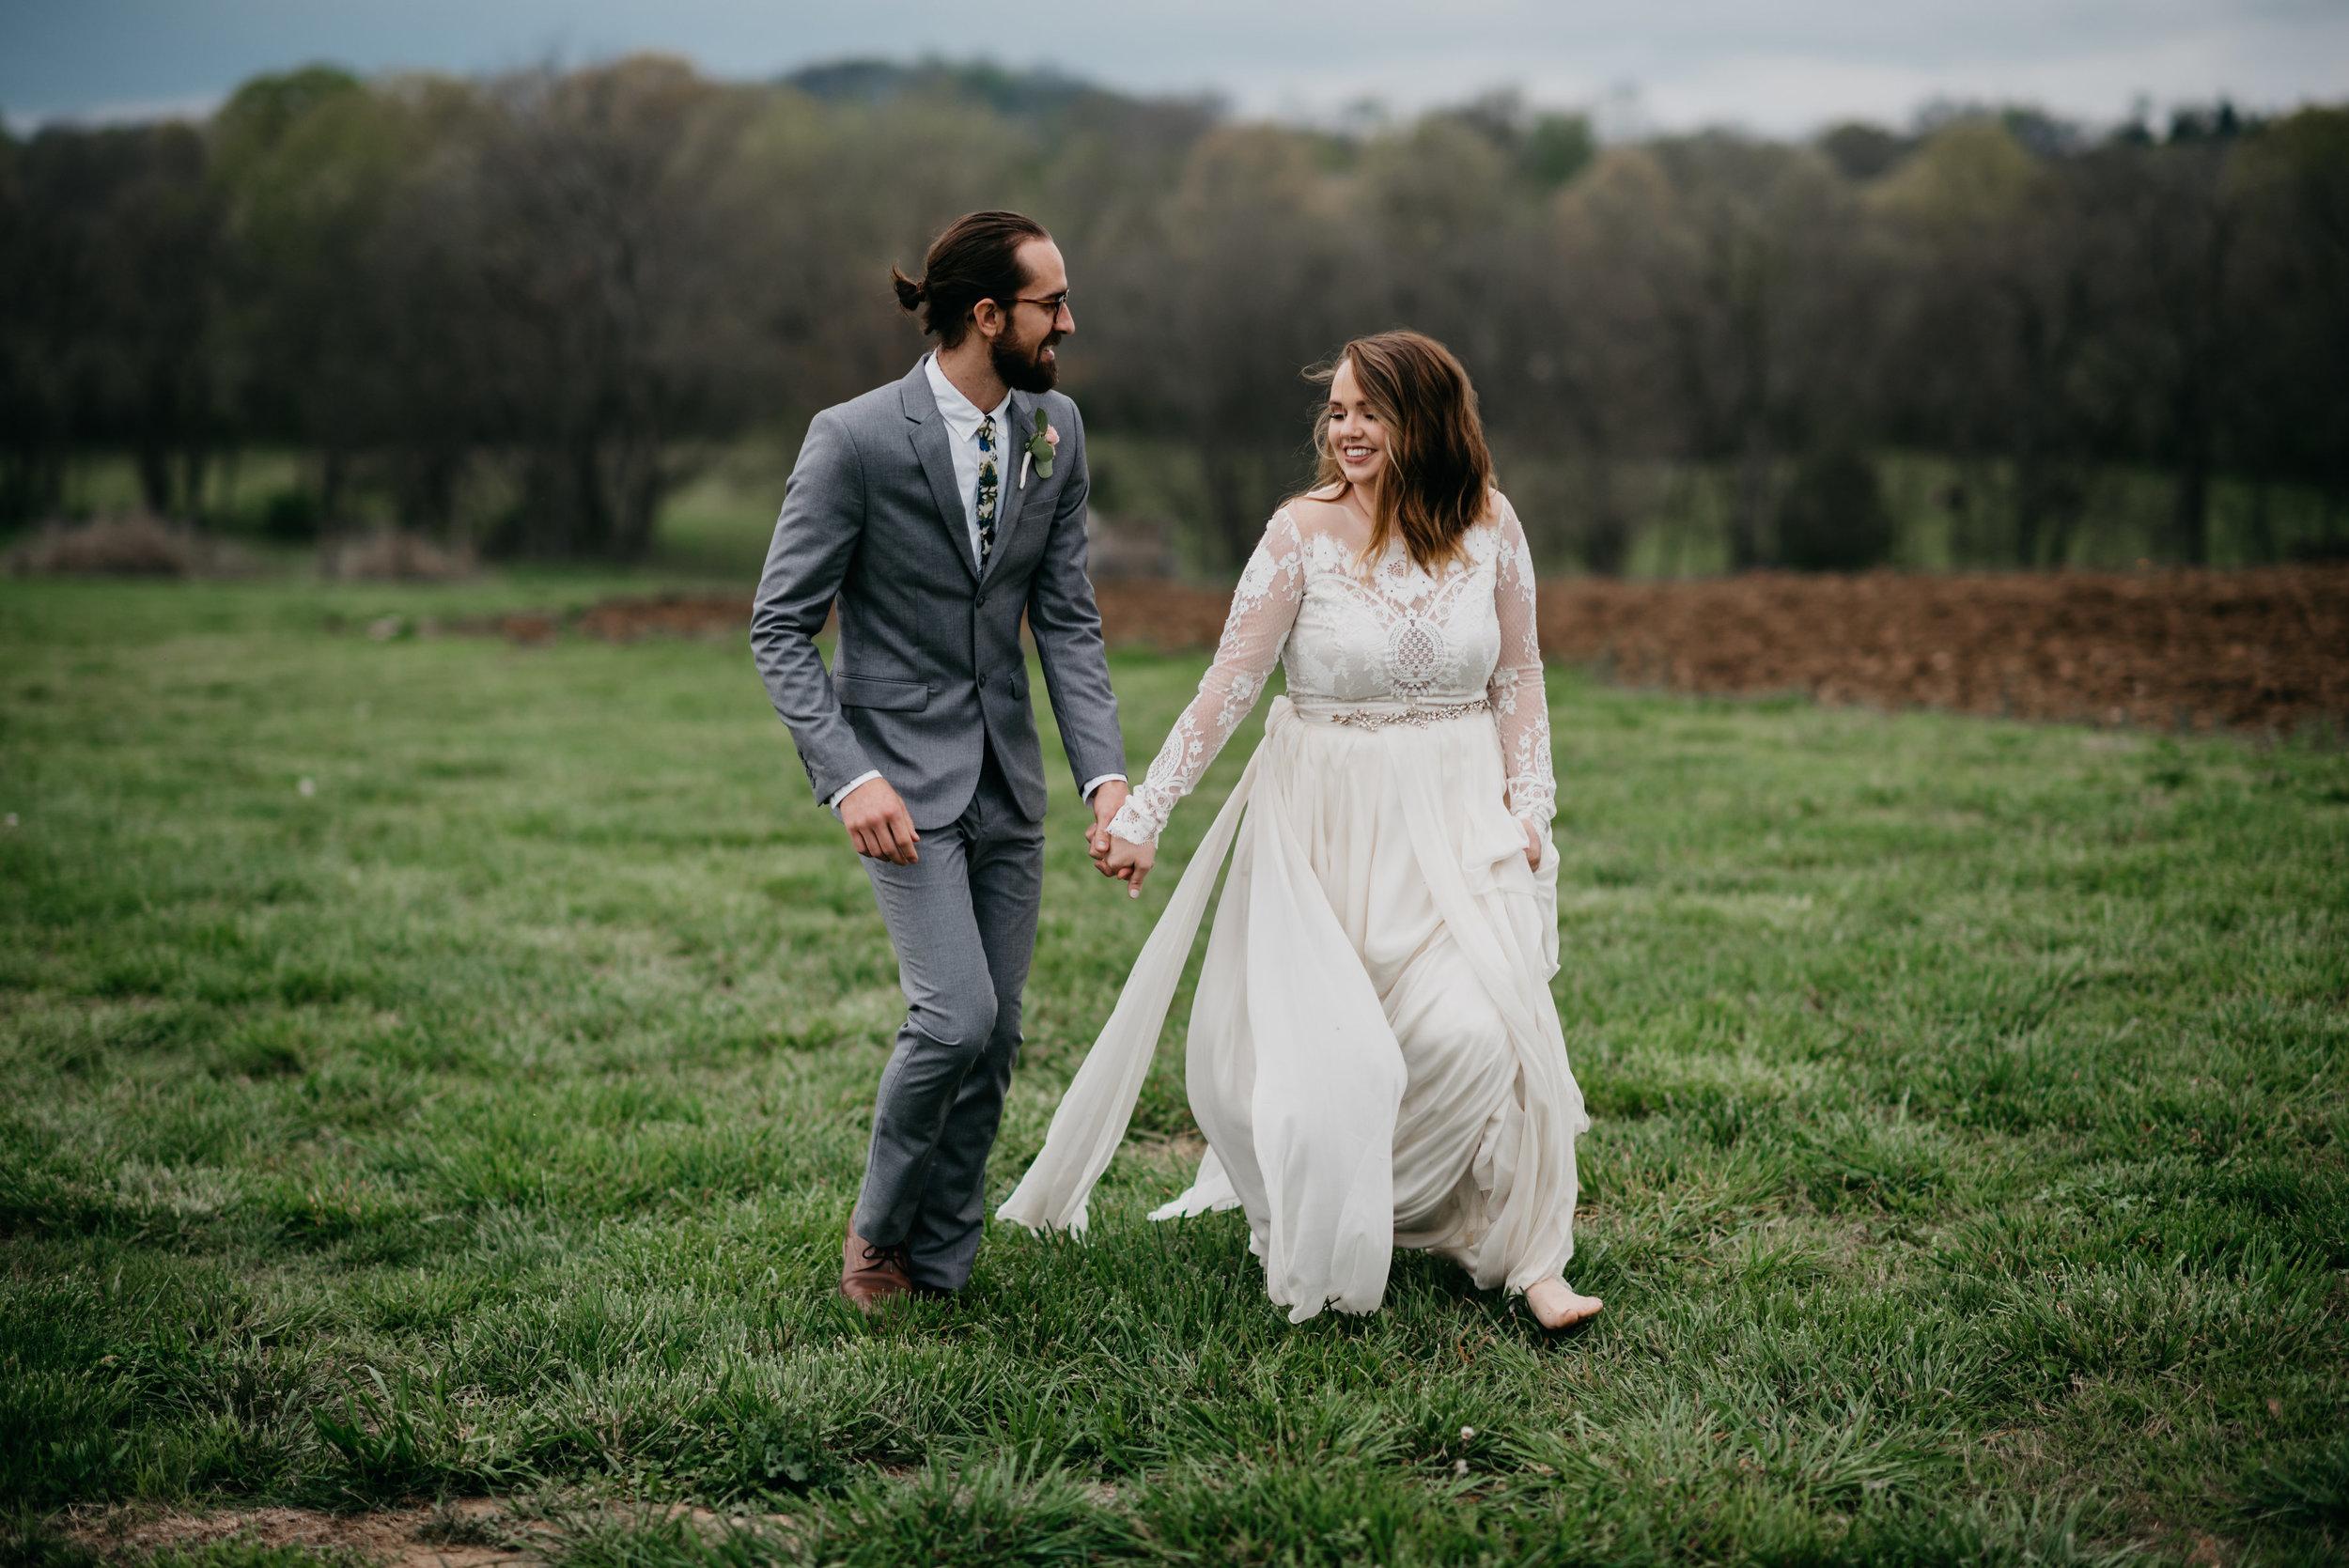 Allenbrooke-Farms-Nashville-Wedding-Photographers 14.jpg